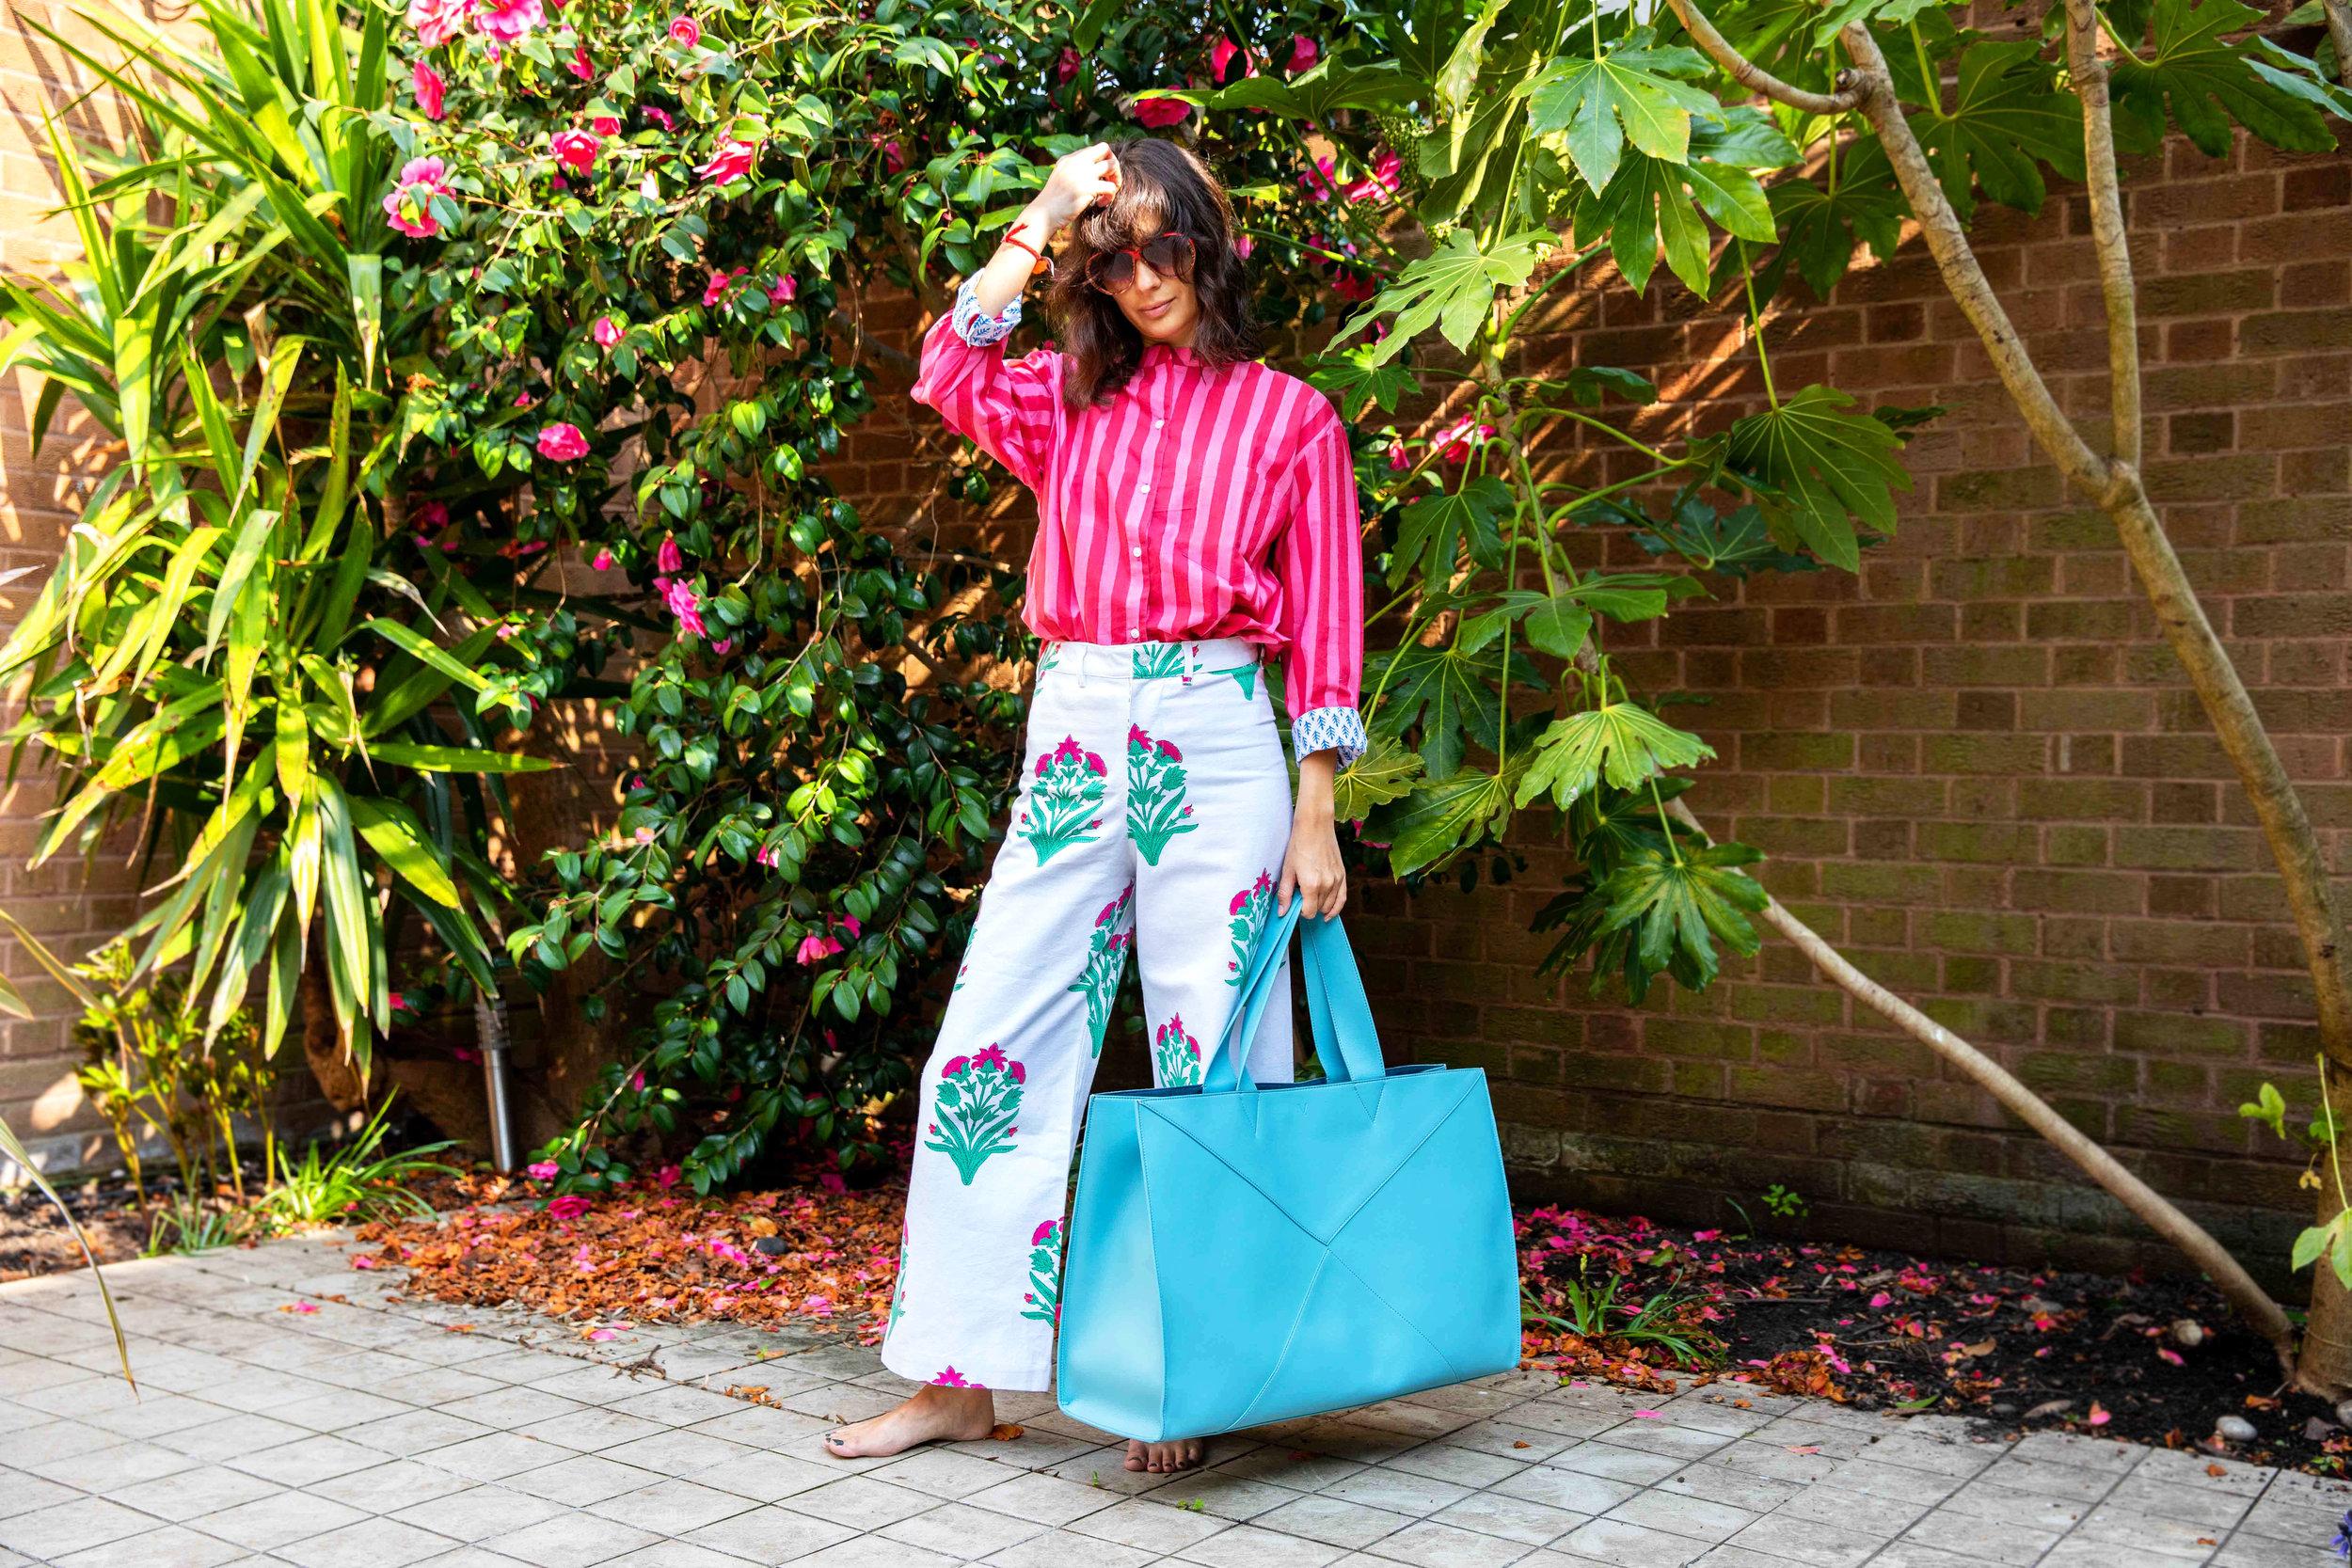 SZ Blockprints  top  &  trousers , V by Townsley  bag , vintage sunglasses